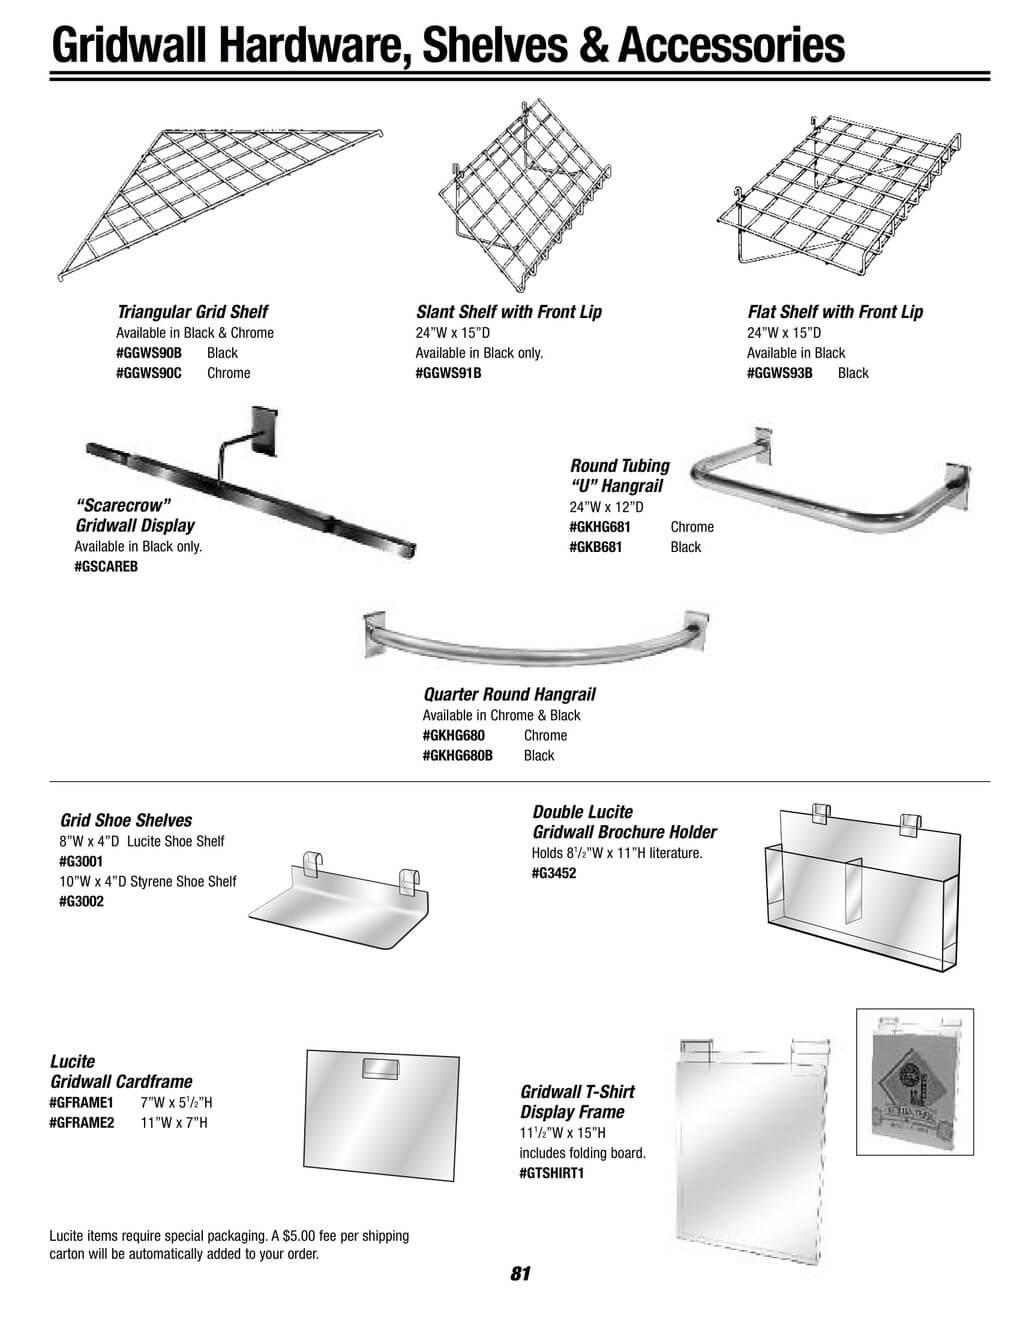 gridwall brochure holders